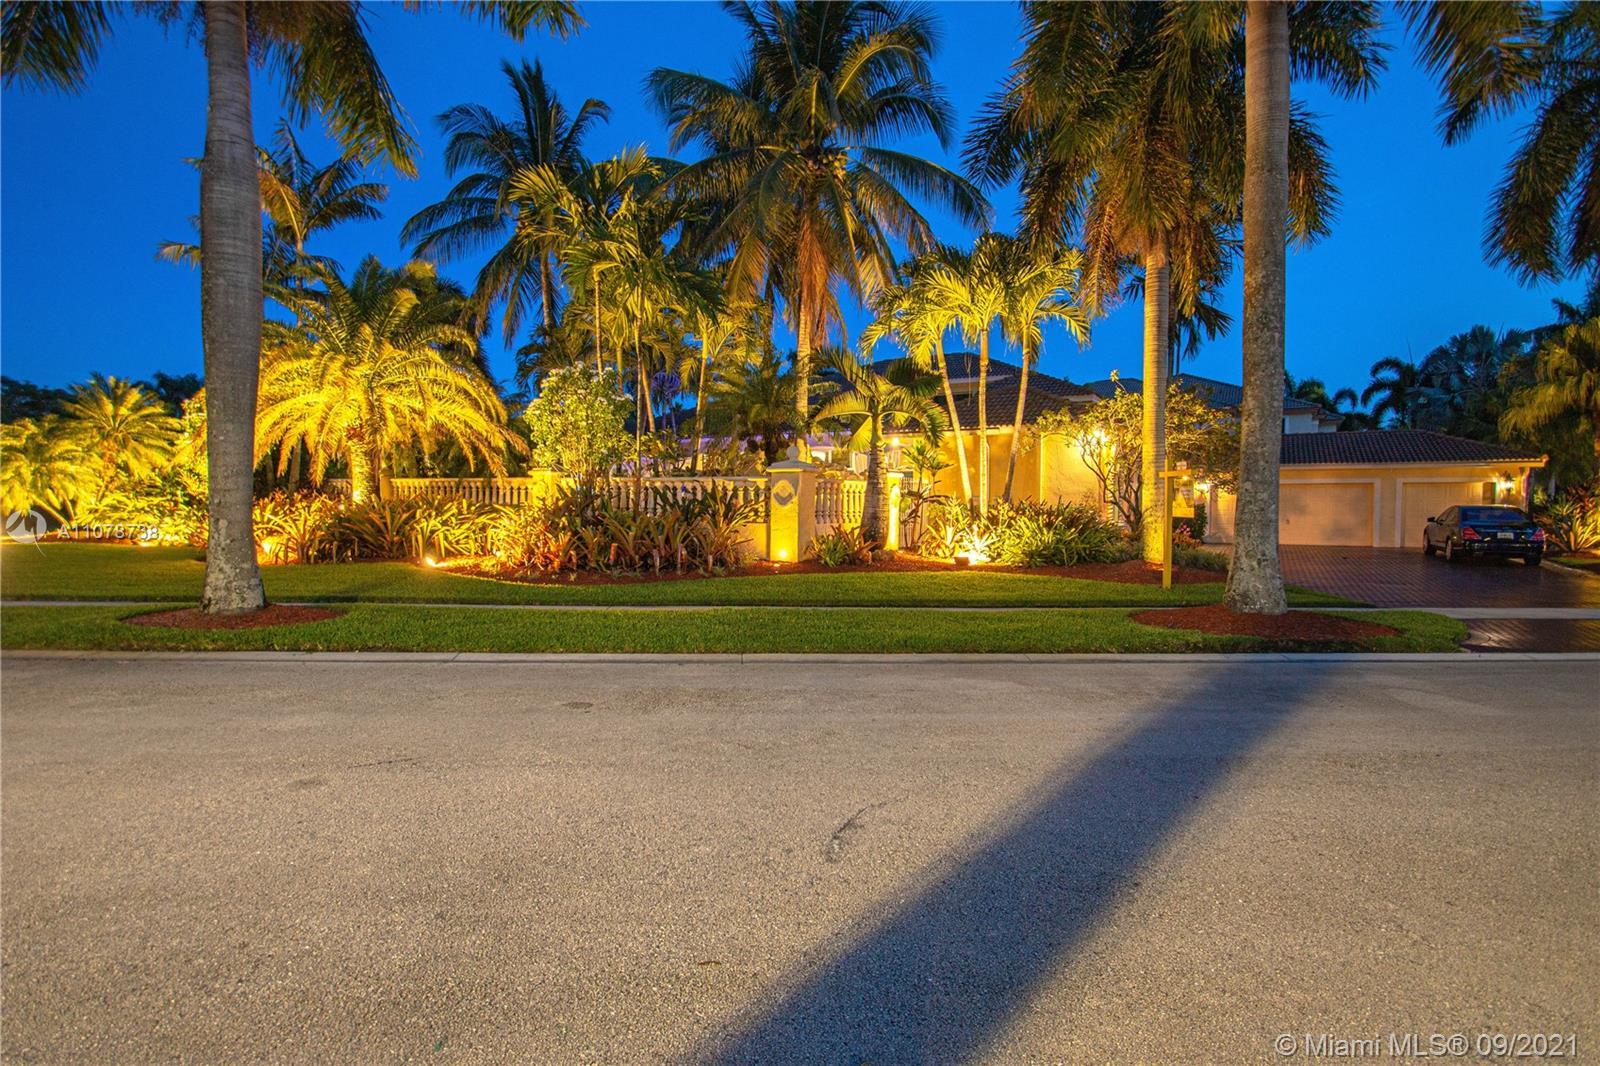 3501 185th Ave, Miramar, Florida 33029